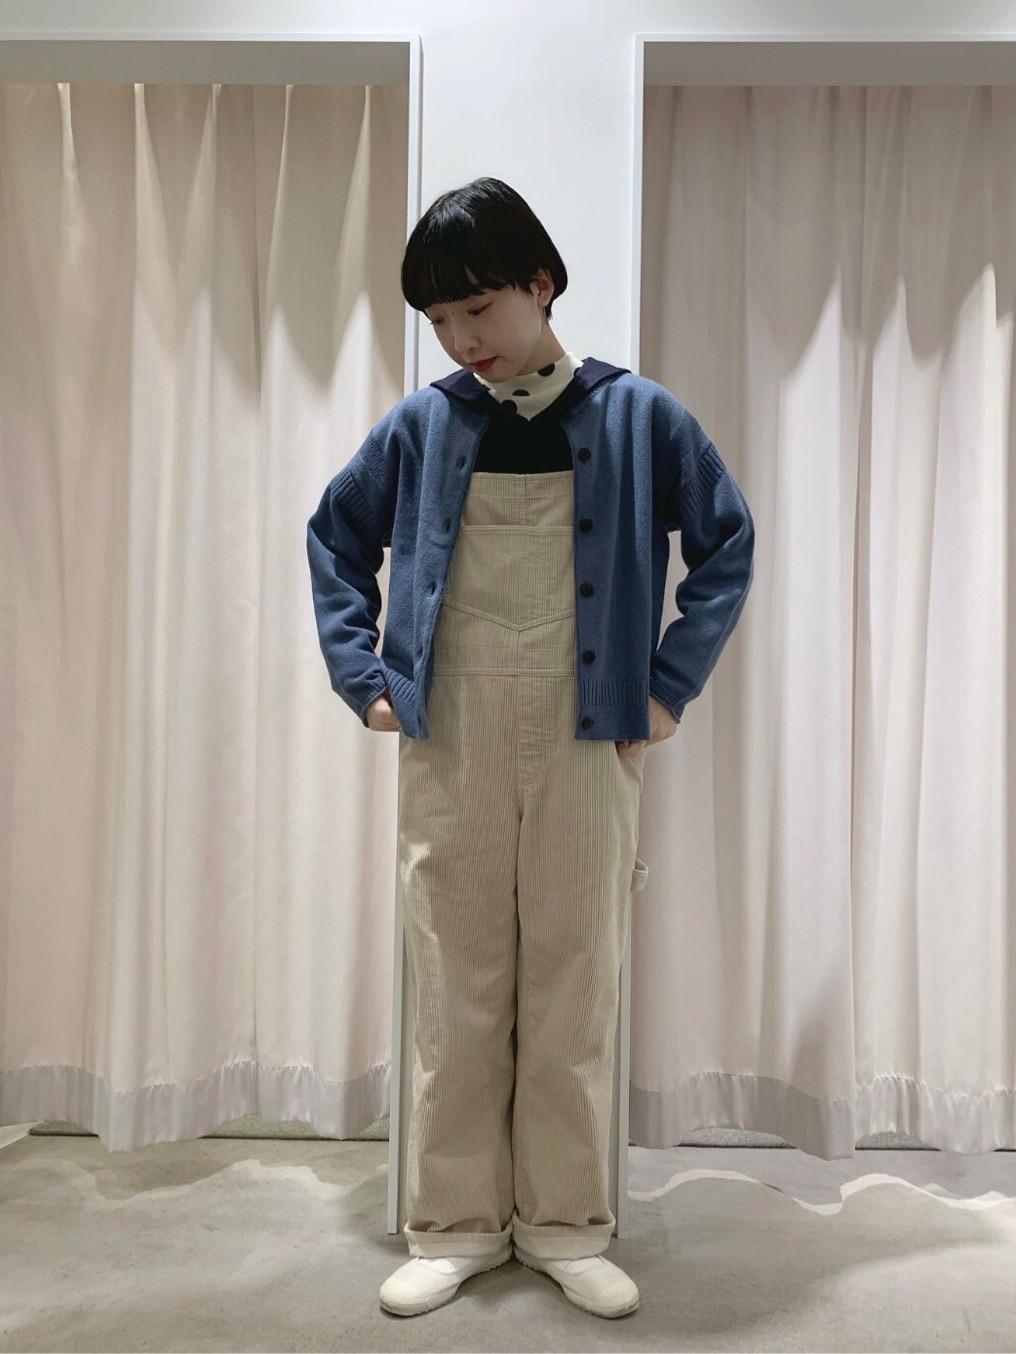 - CHILD WOMAN CHILD WOMAN , PAR ICI ルミネ横浜 身長:157cm 2020.12.15